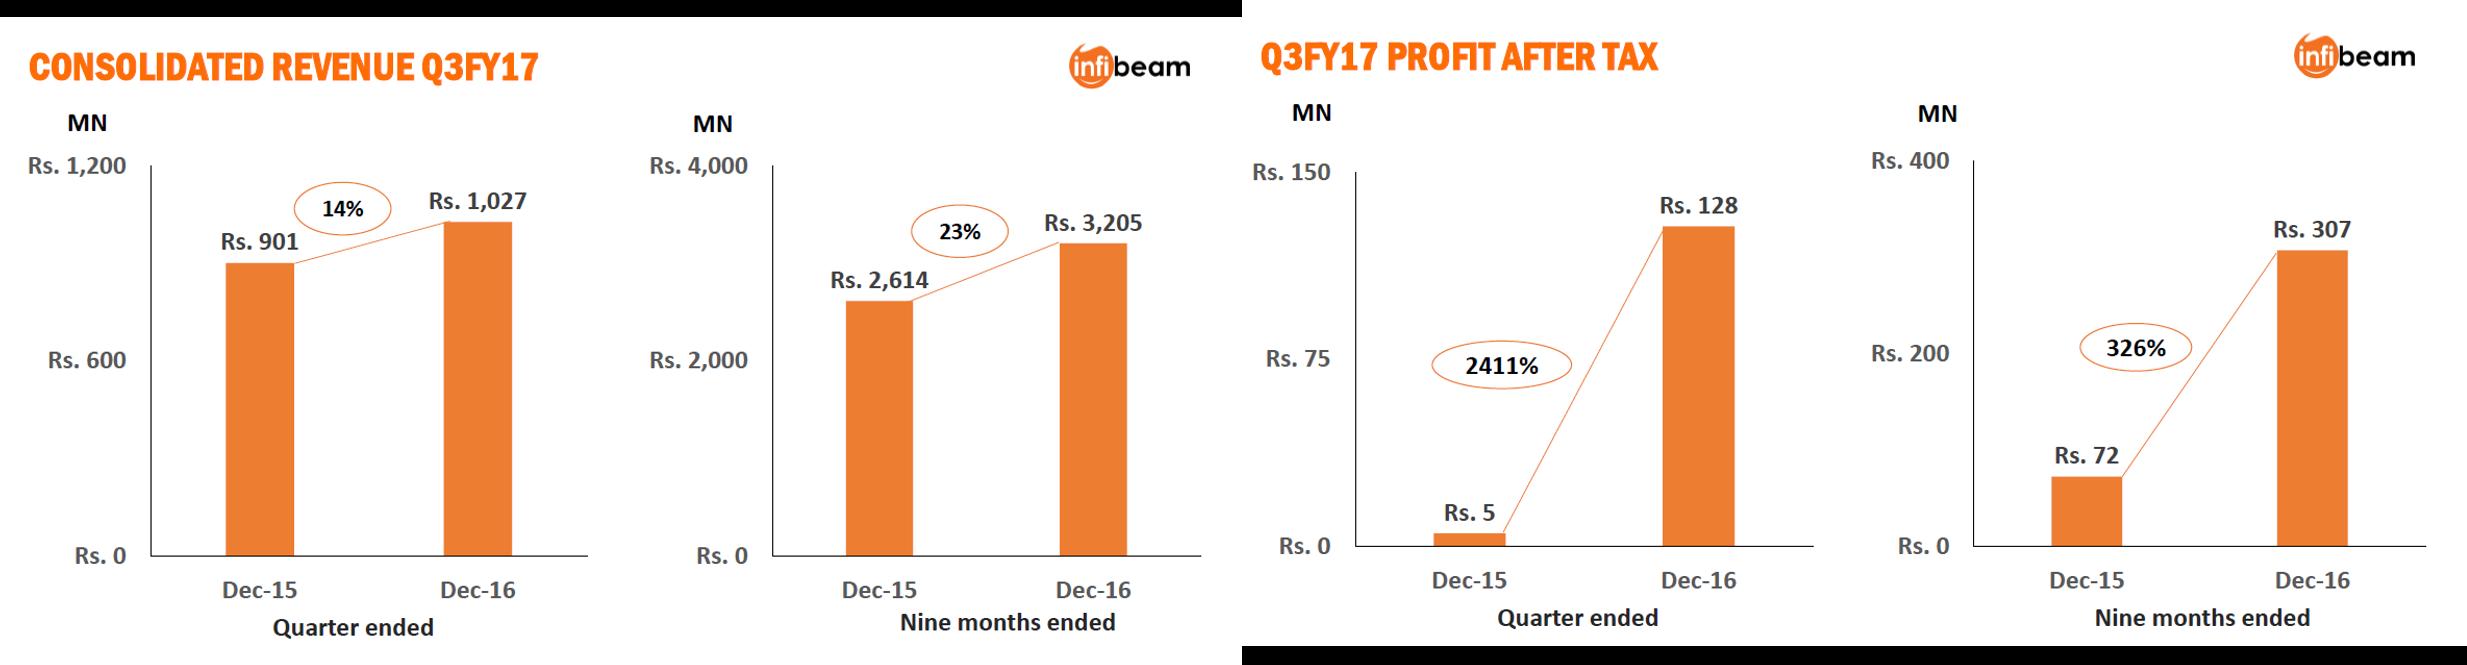 Infibeam Q3FY17 Financial Highlights.png